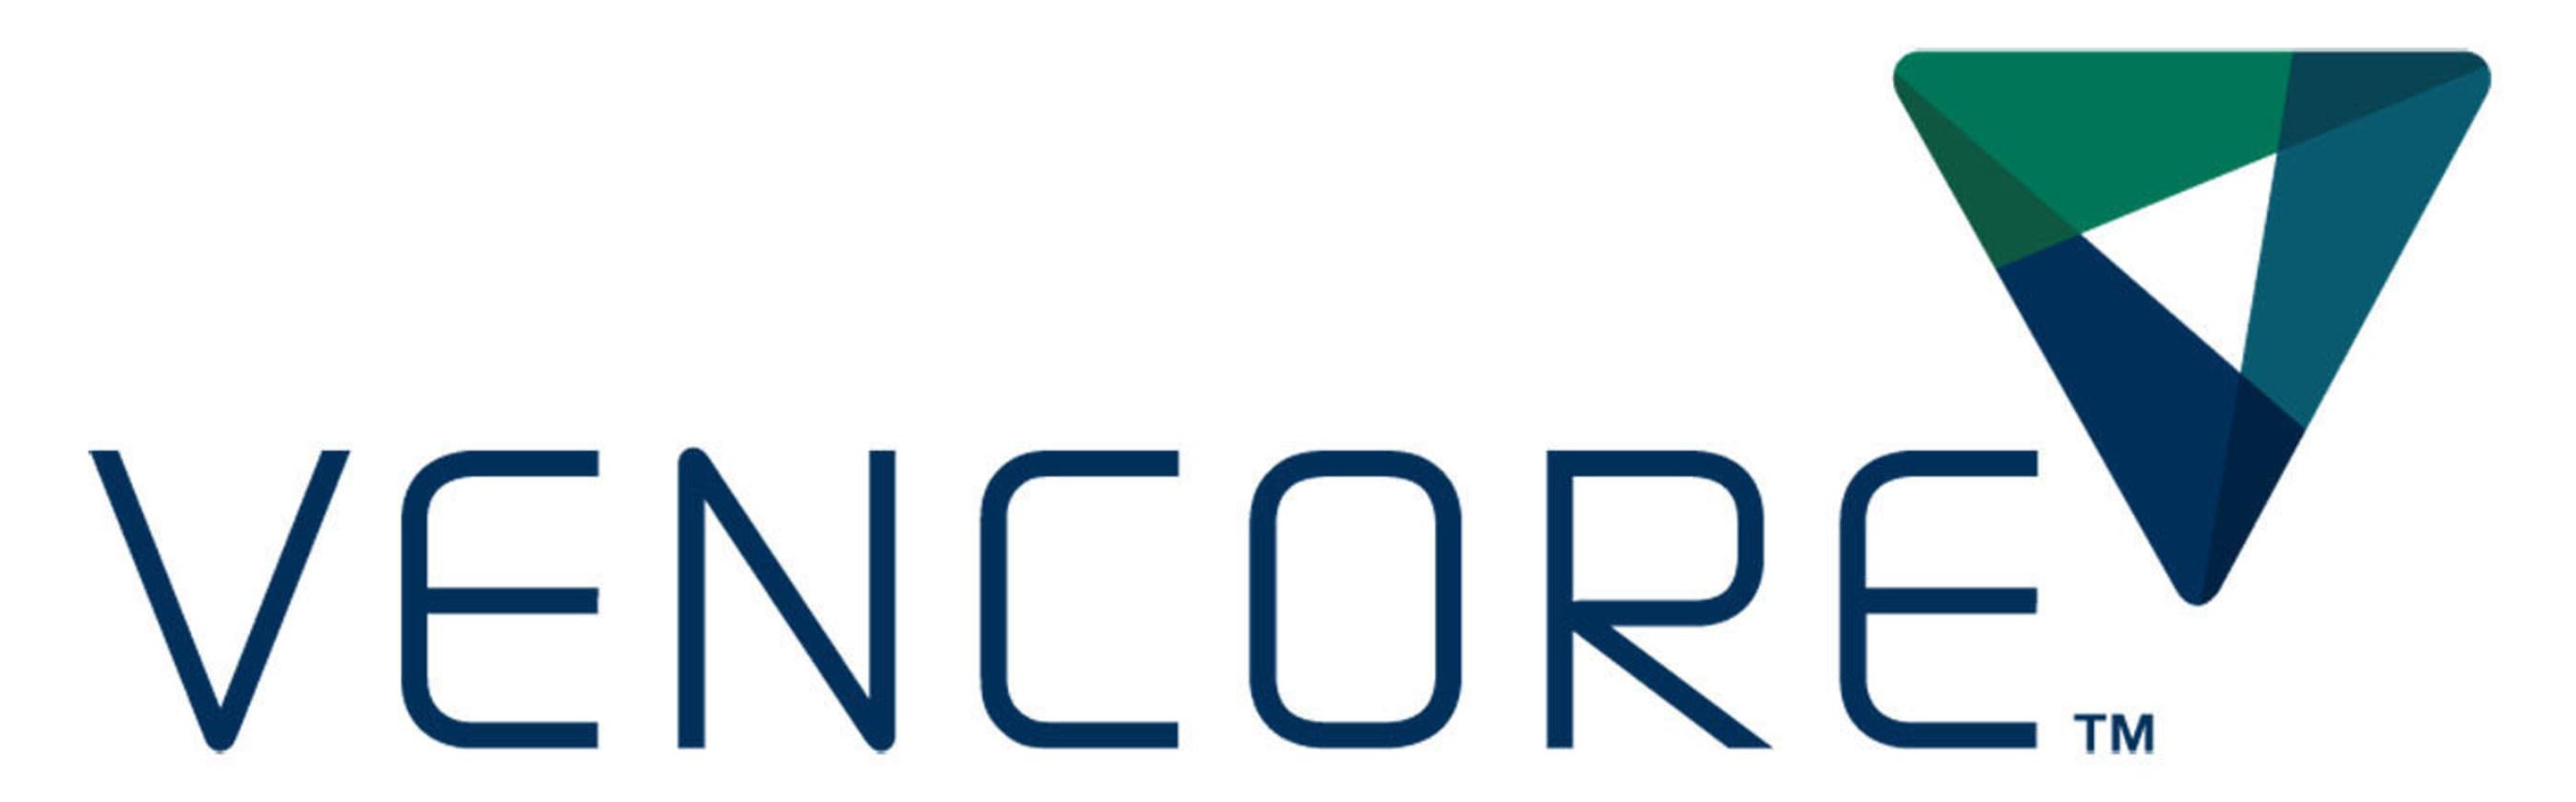 Vencore logo (PRNewsFoto/The SI Organization, Inc.)